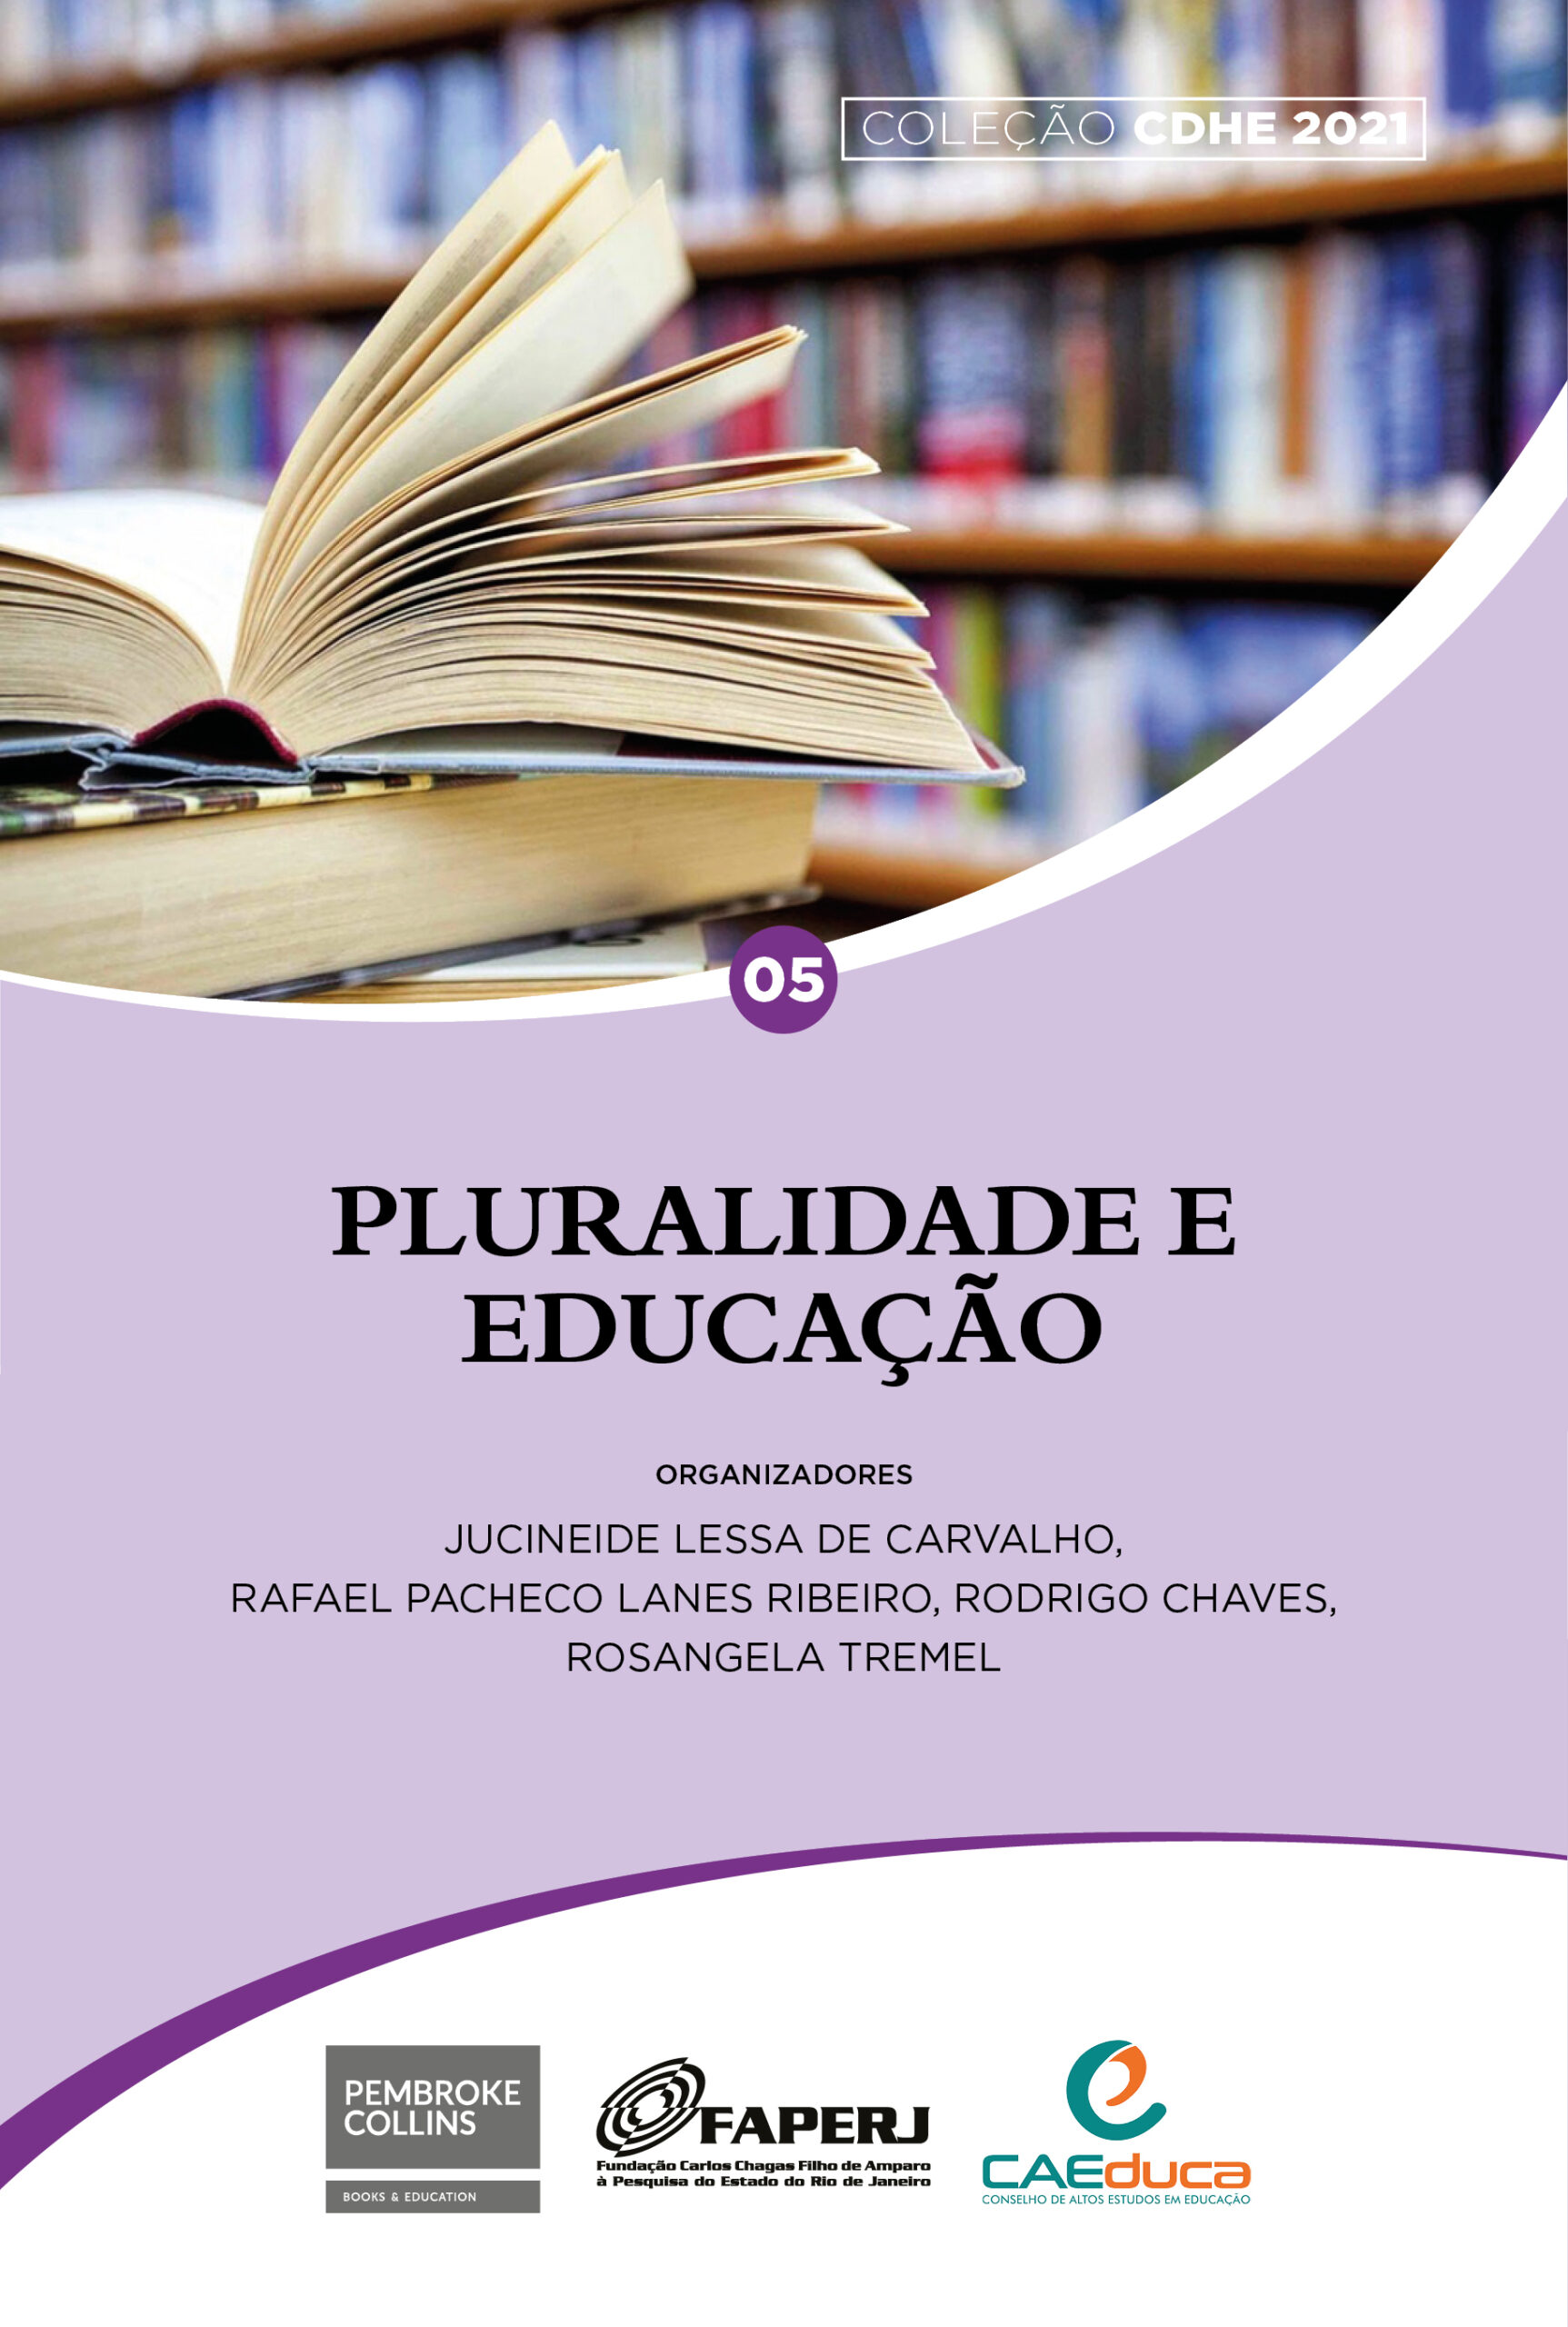 05-CDHE-2021-CAPA-pluralidade-e-educacao